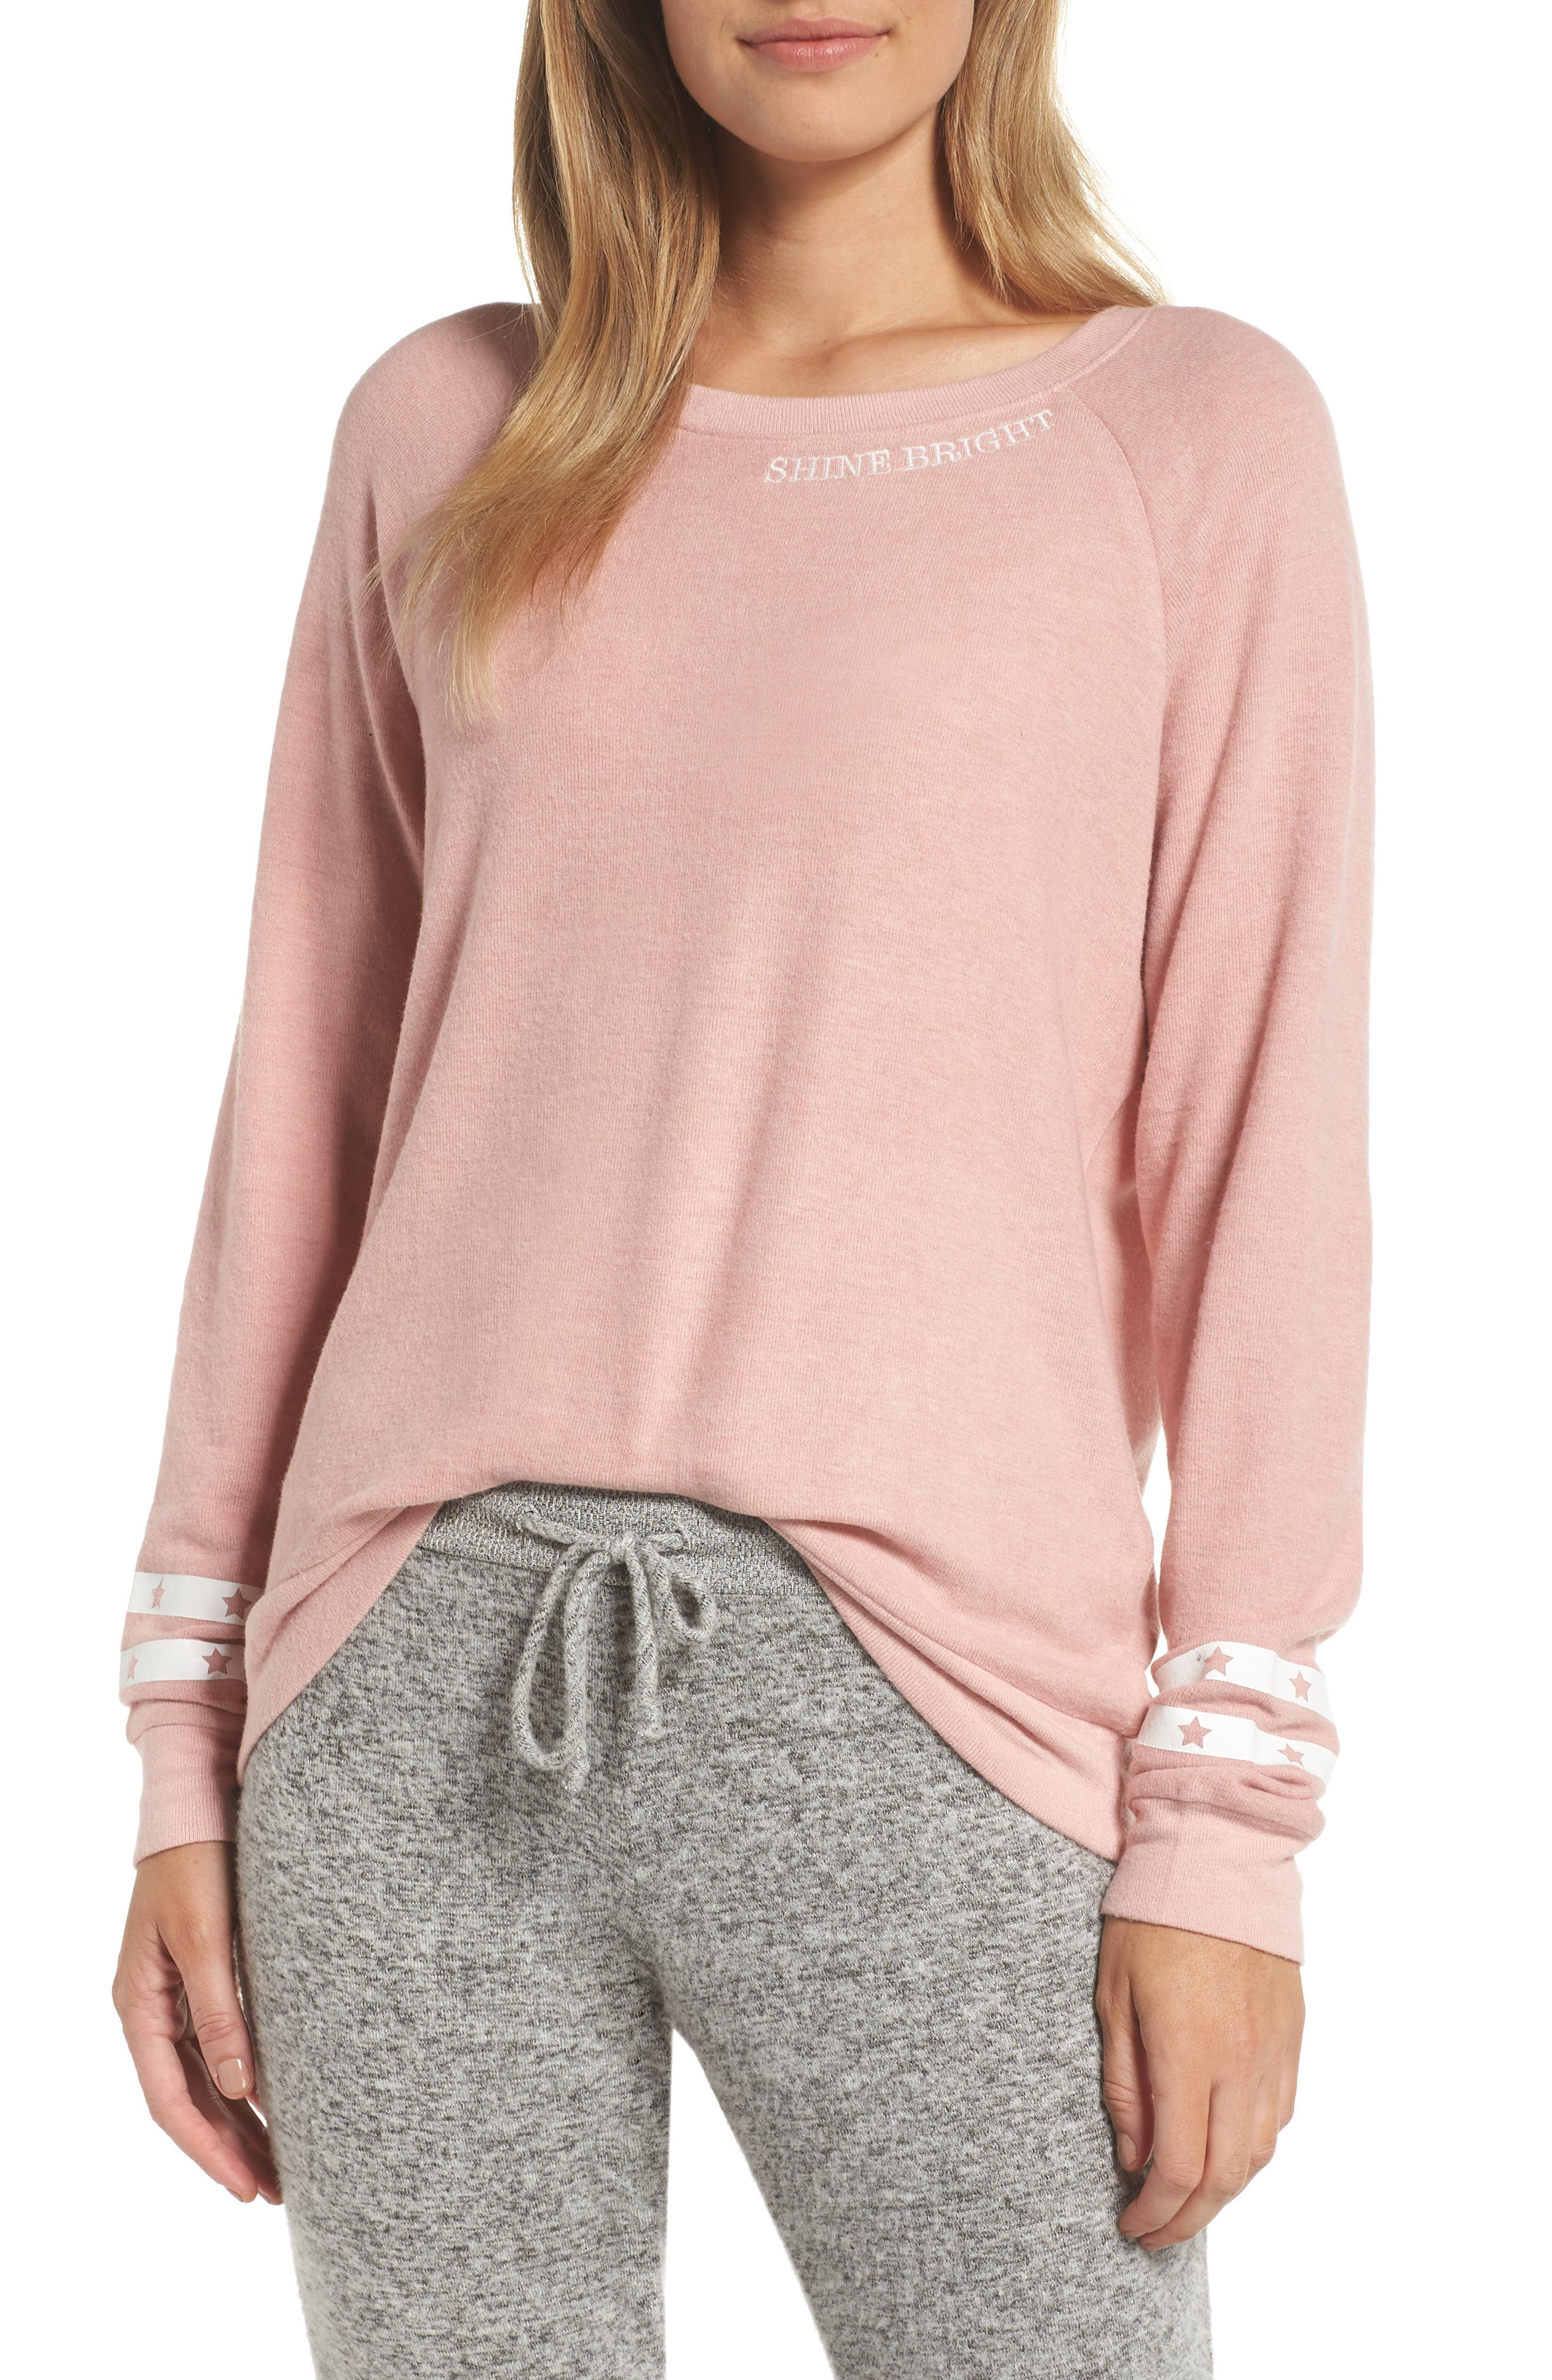 PJ SALVAGE Peachy Jersey Pajama Top in Rose